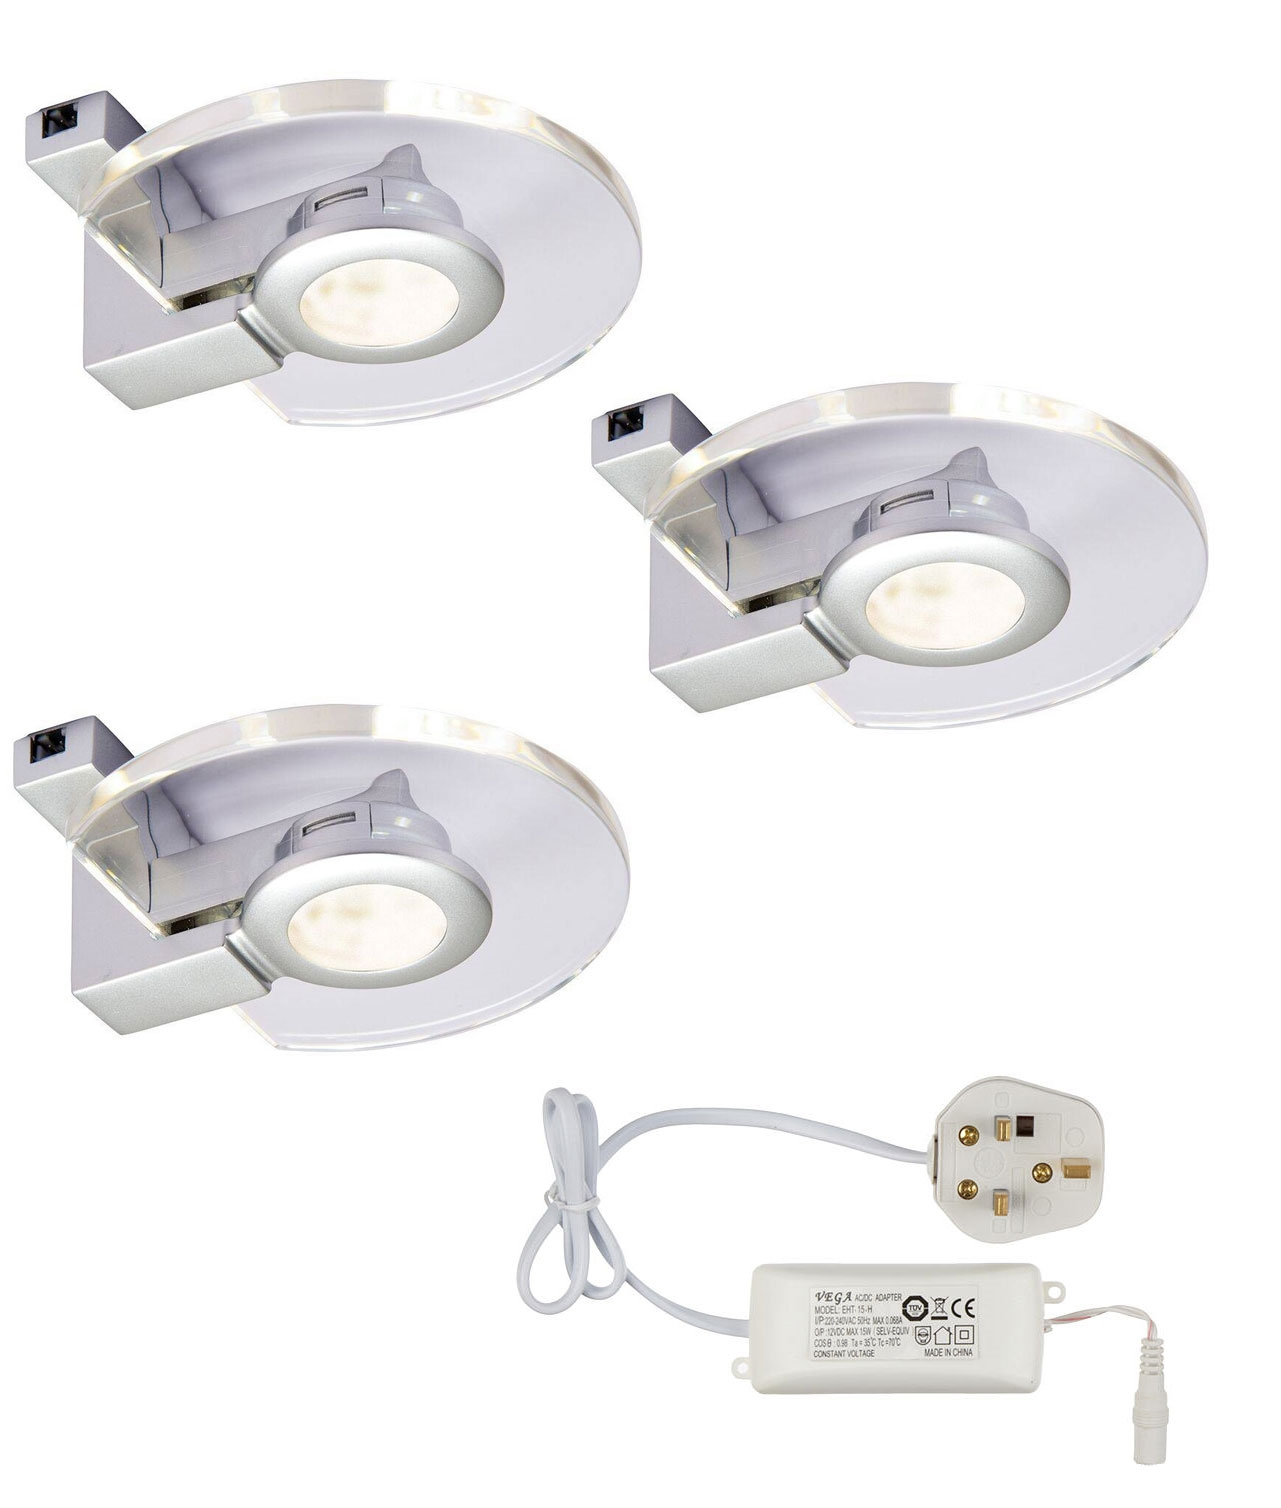 led under cabinet lights easy install pack of 3